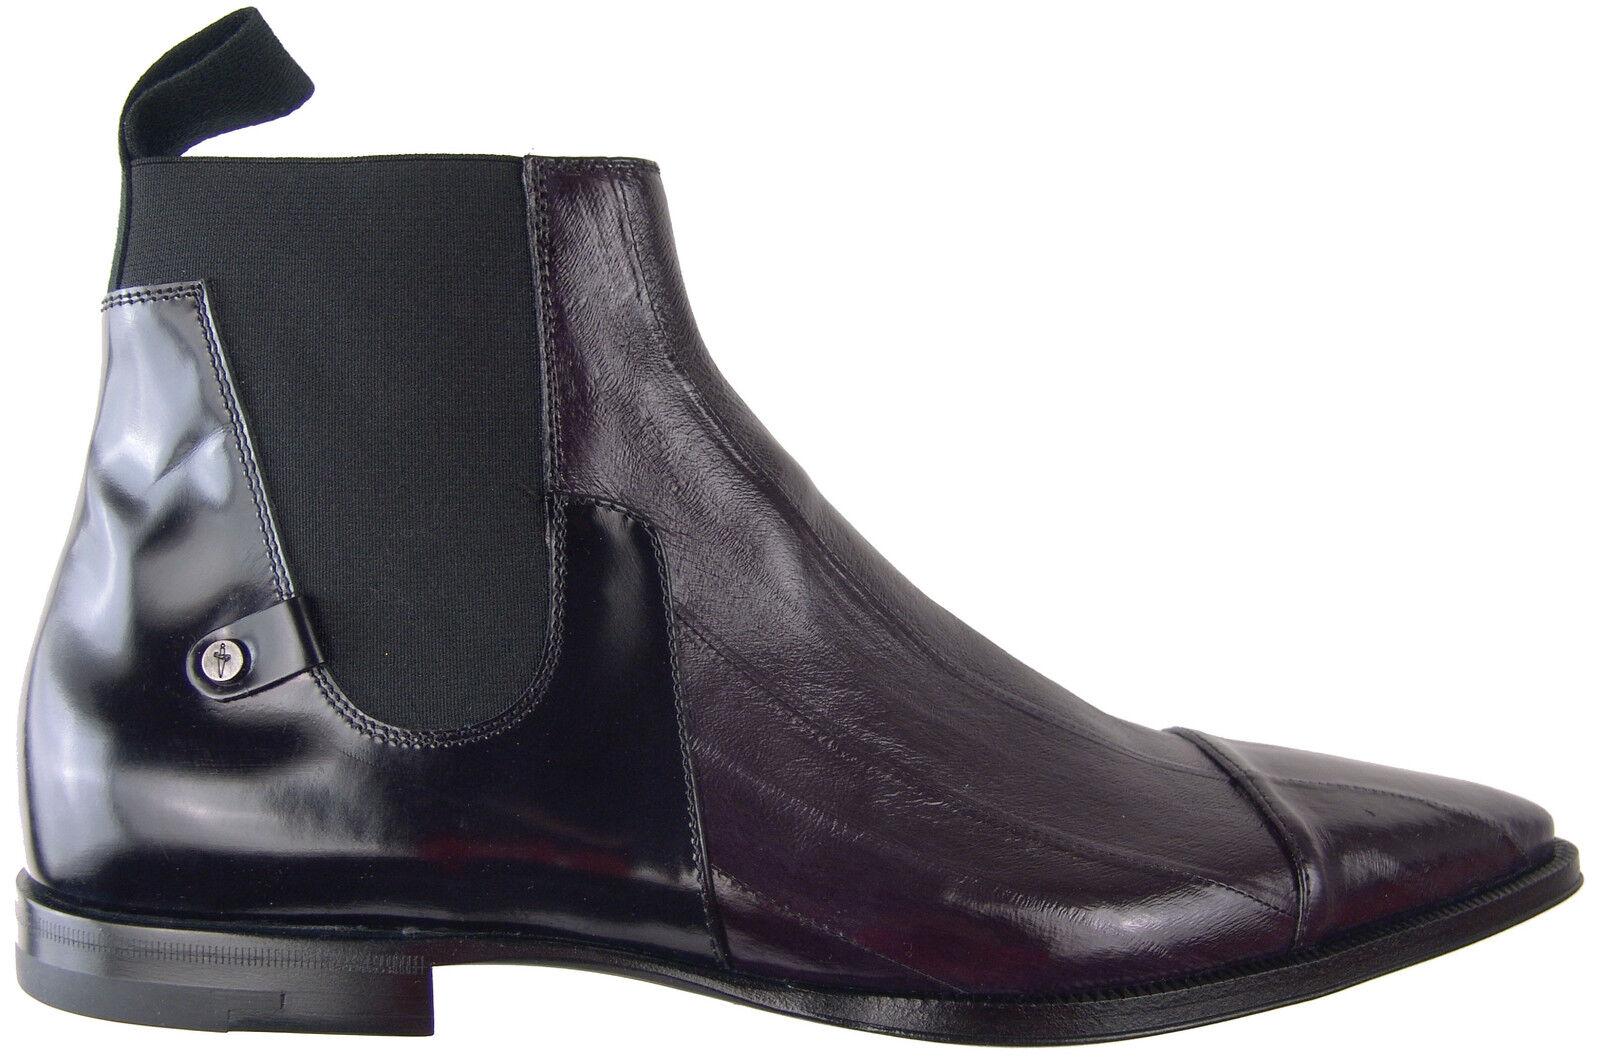 960 Cesare Paciotti Eel Ankle Stivali US 8 Italian Italian 8 Designer Shoes e5adfe